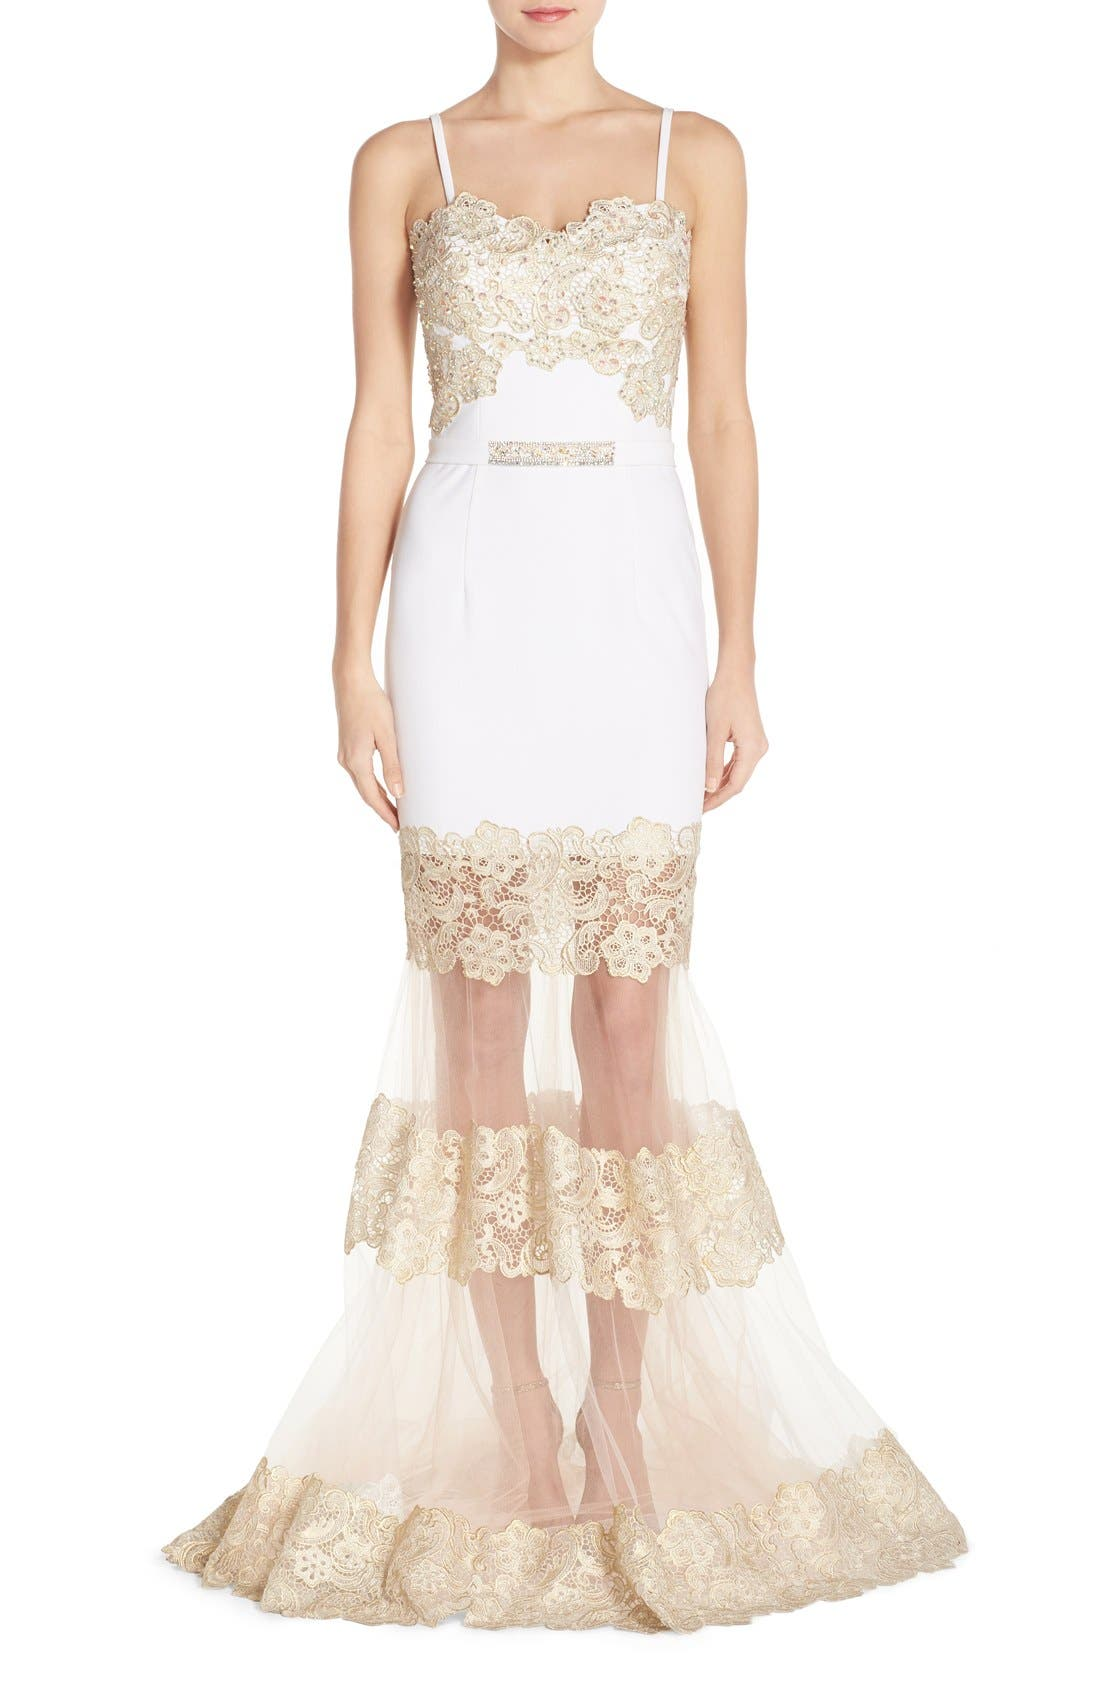 Main Image - Terani Couture Illusion Lace & Crepe Mermaid Gown